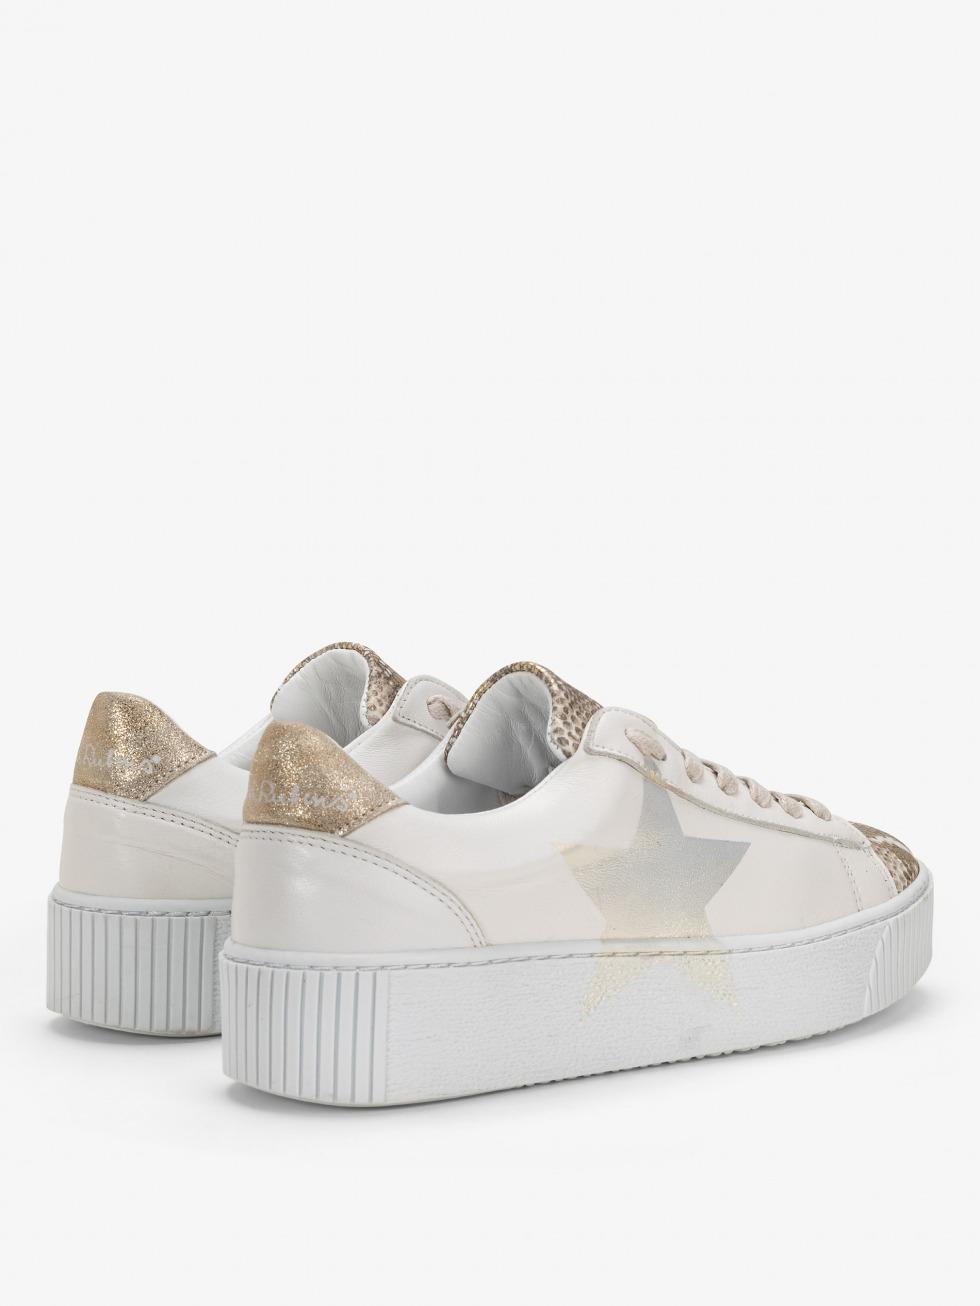 sneakers-bianche-da-donna-cosmopolitan-stella-phyton-gold (2)